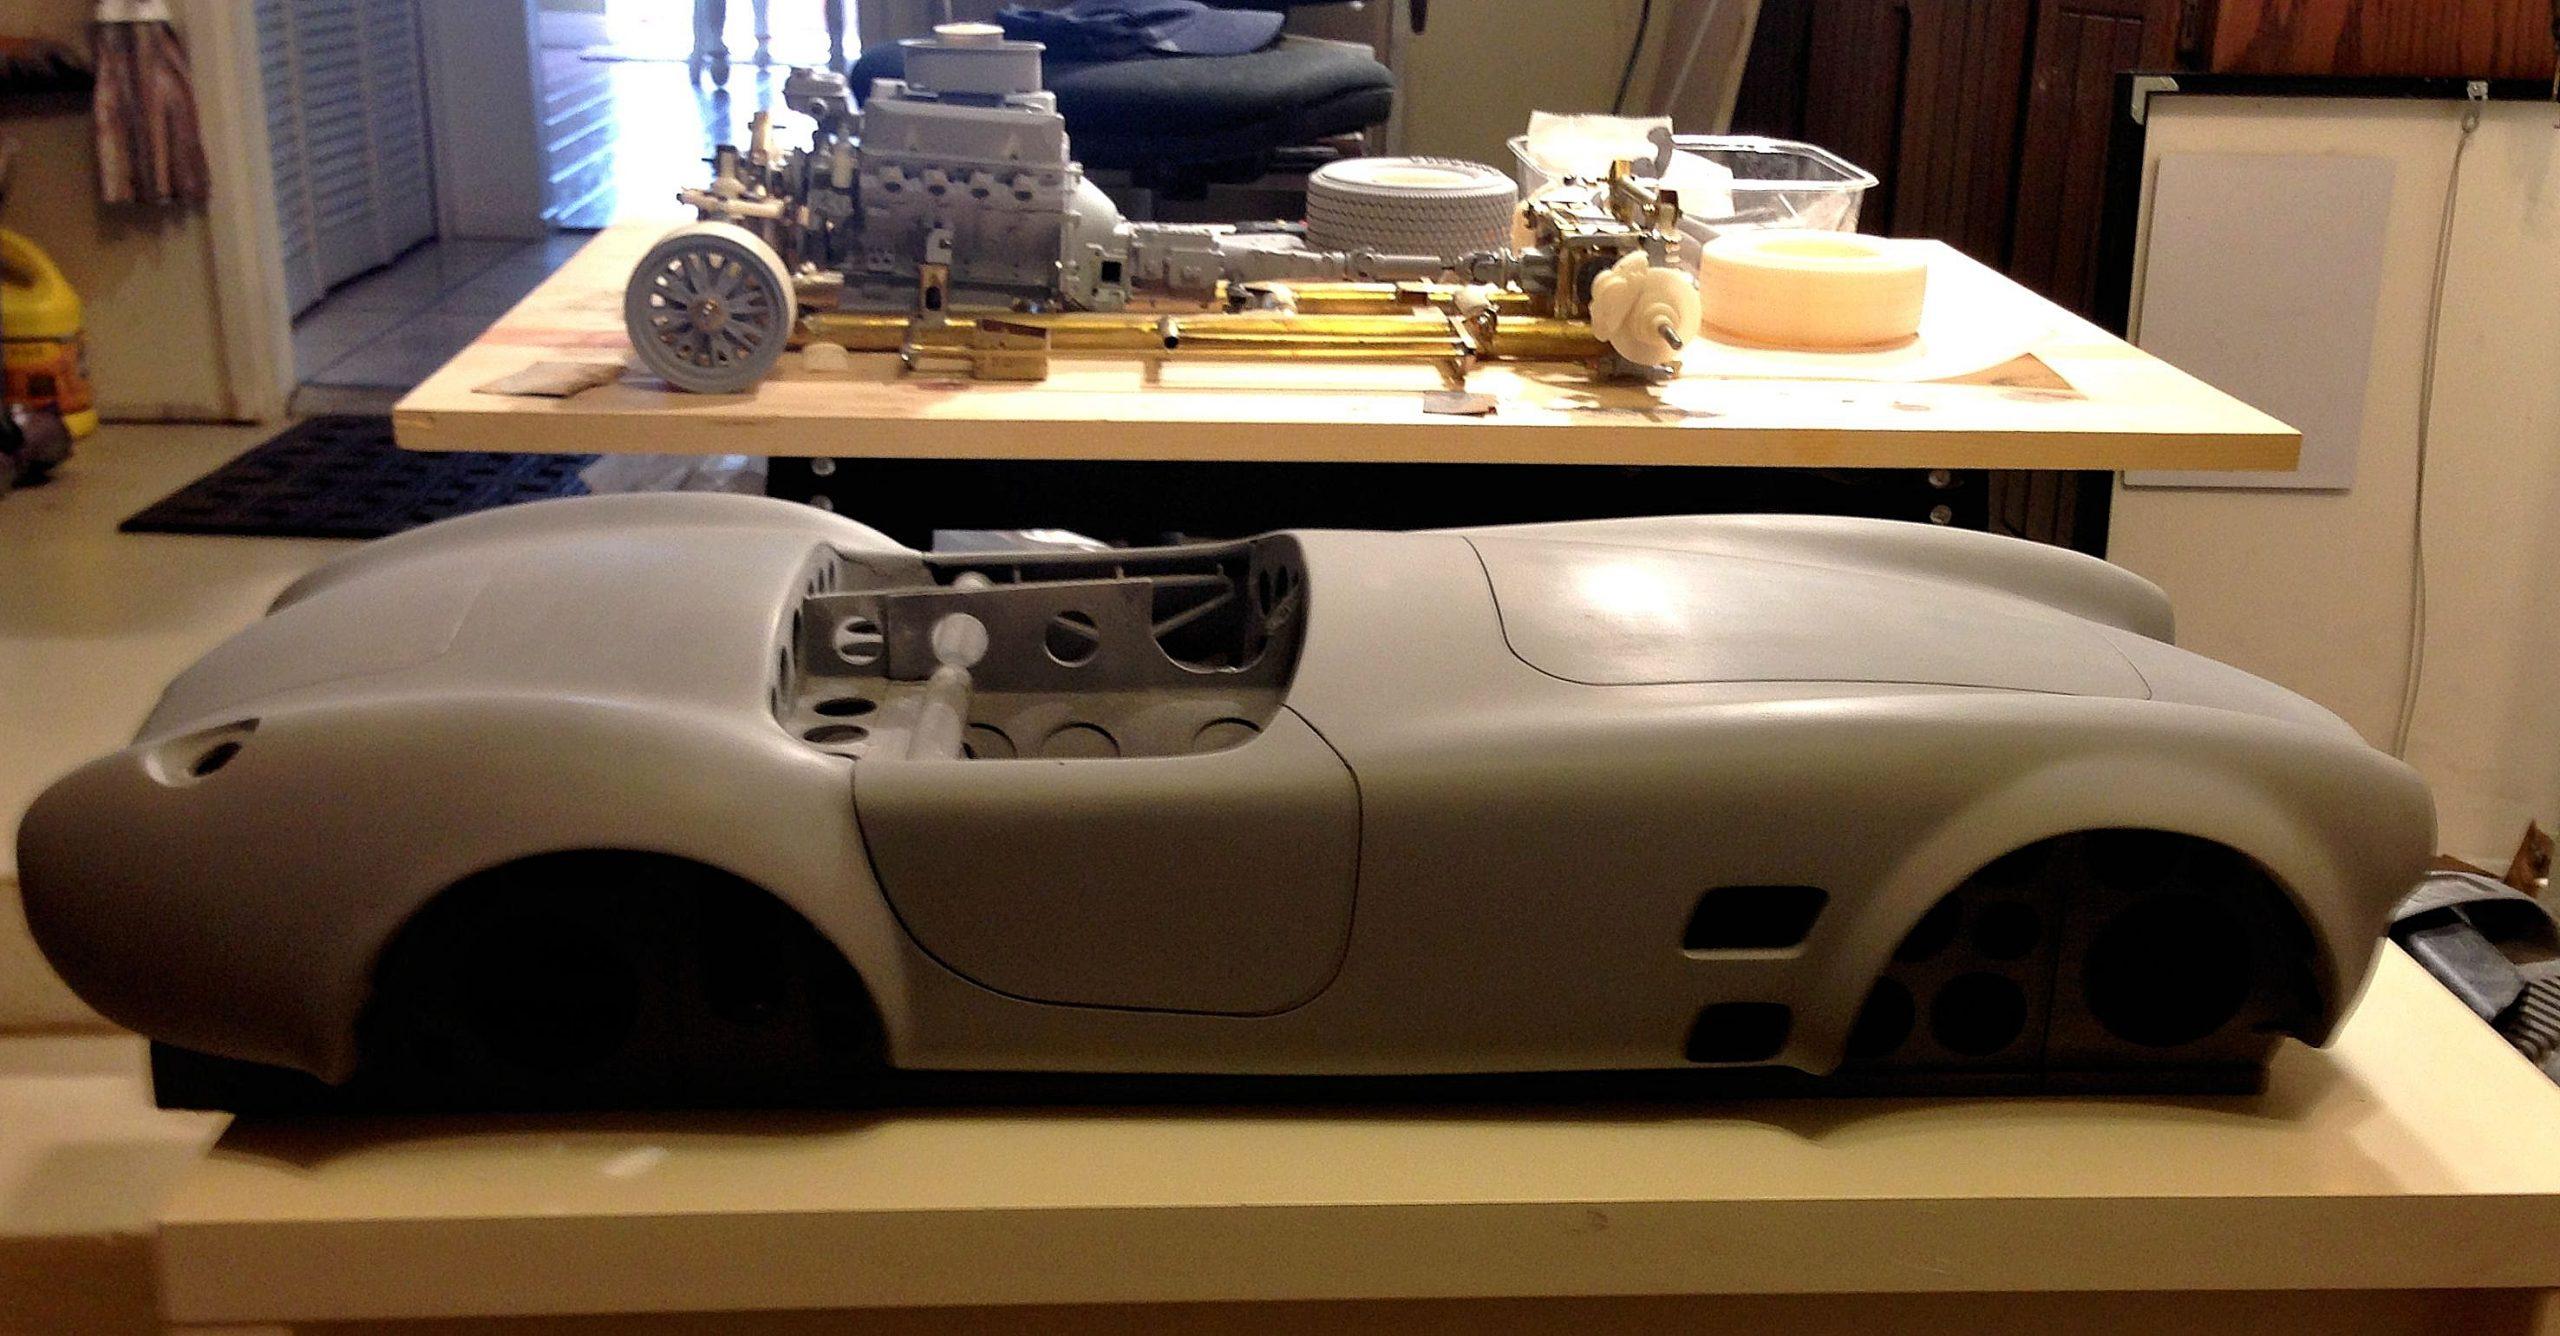 Essex Cobra scale model body mold